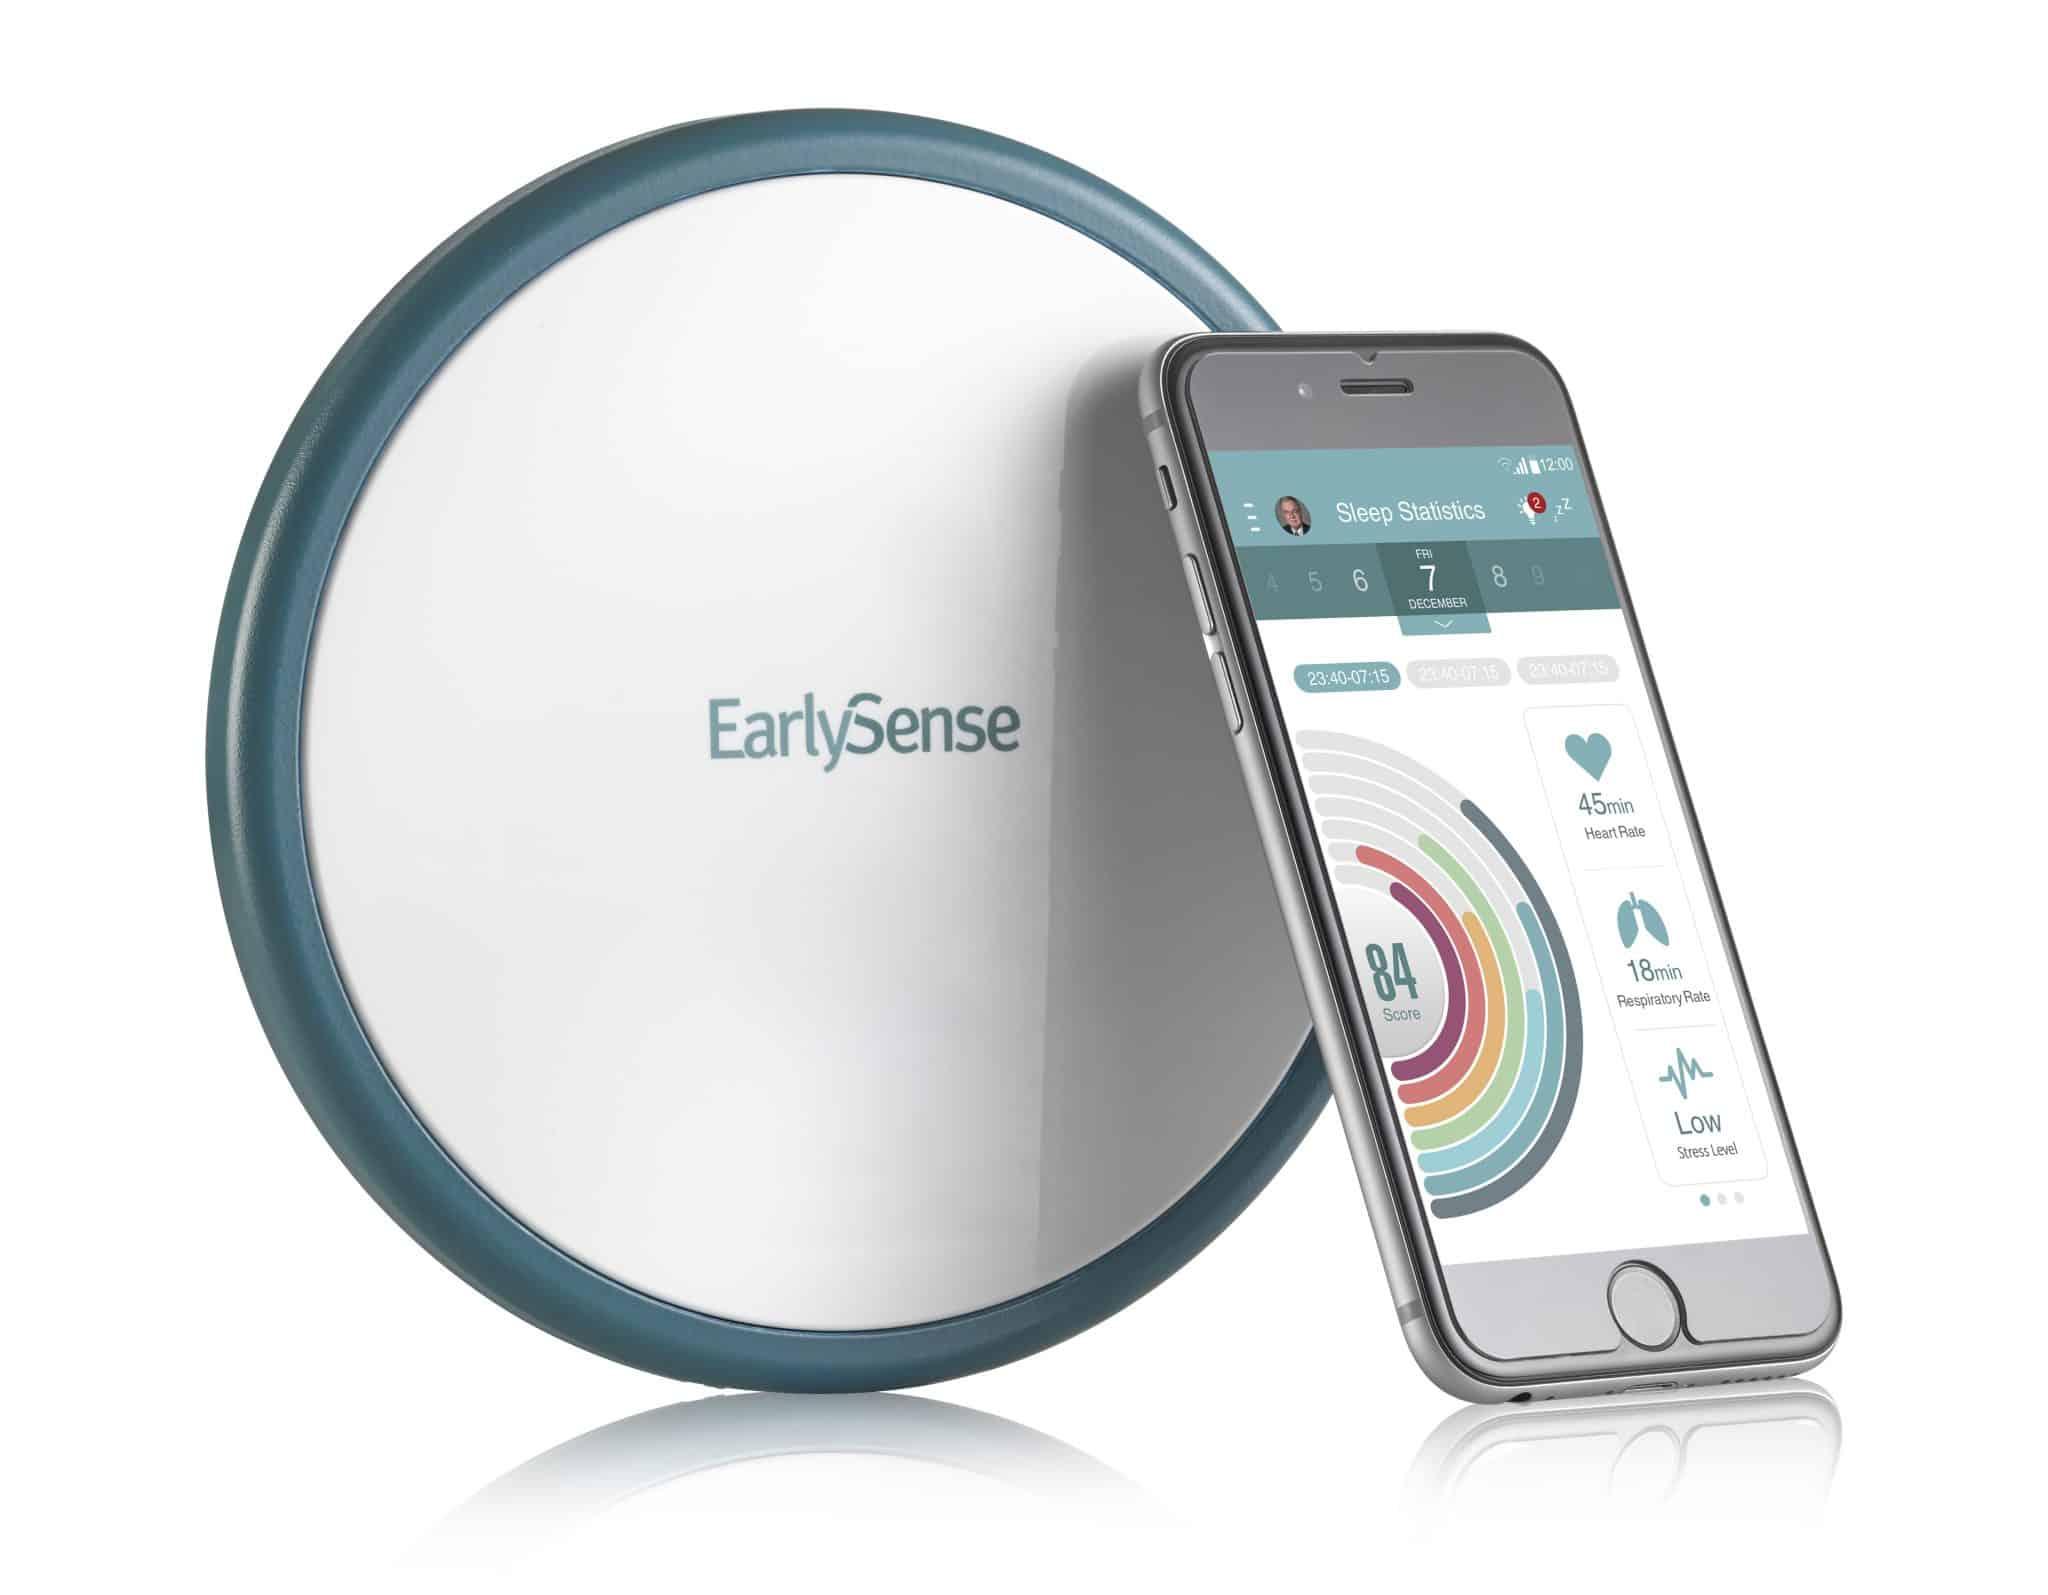 EarlySense Live Sleep Tracker App Review